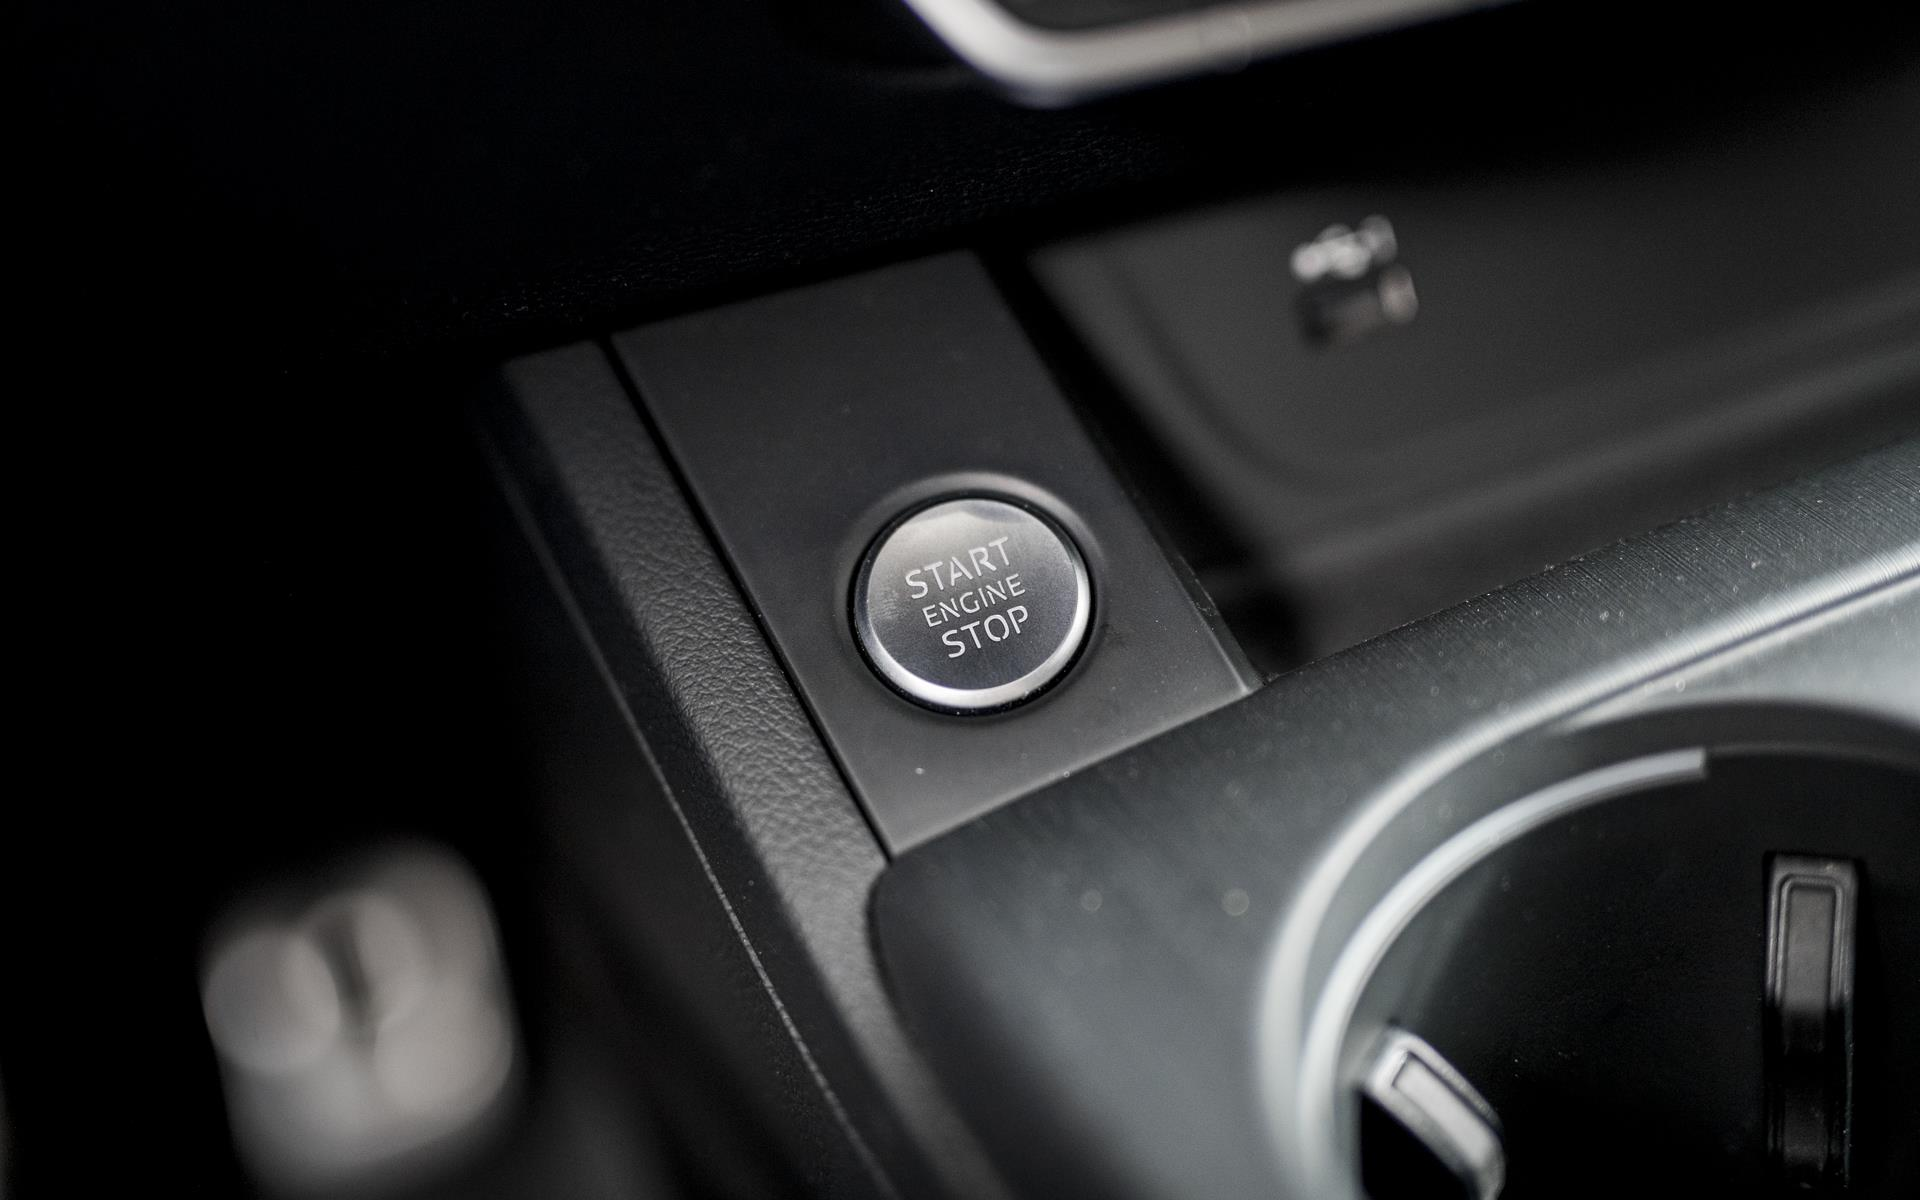 Avant 2,0 TDI S-Line Black Edition TipTronic 190HK Stc  image14